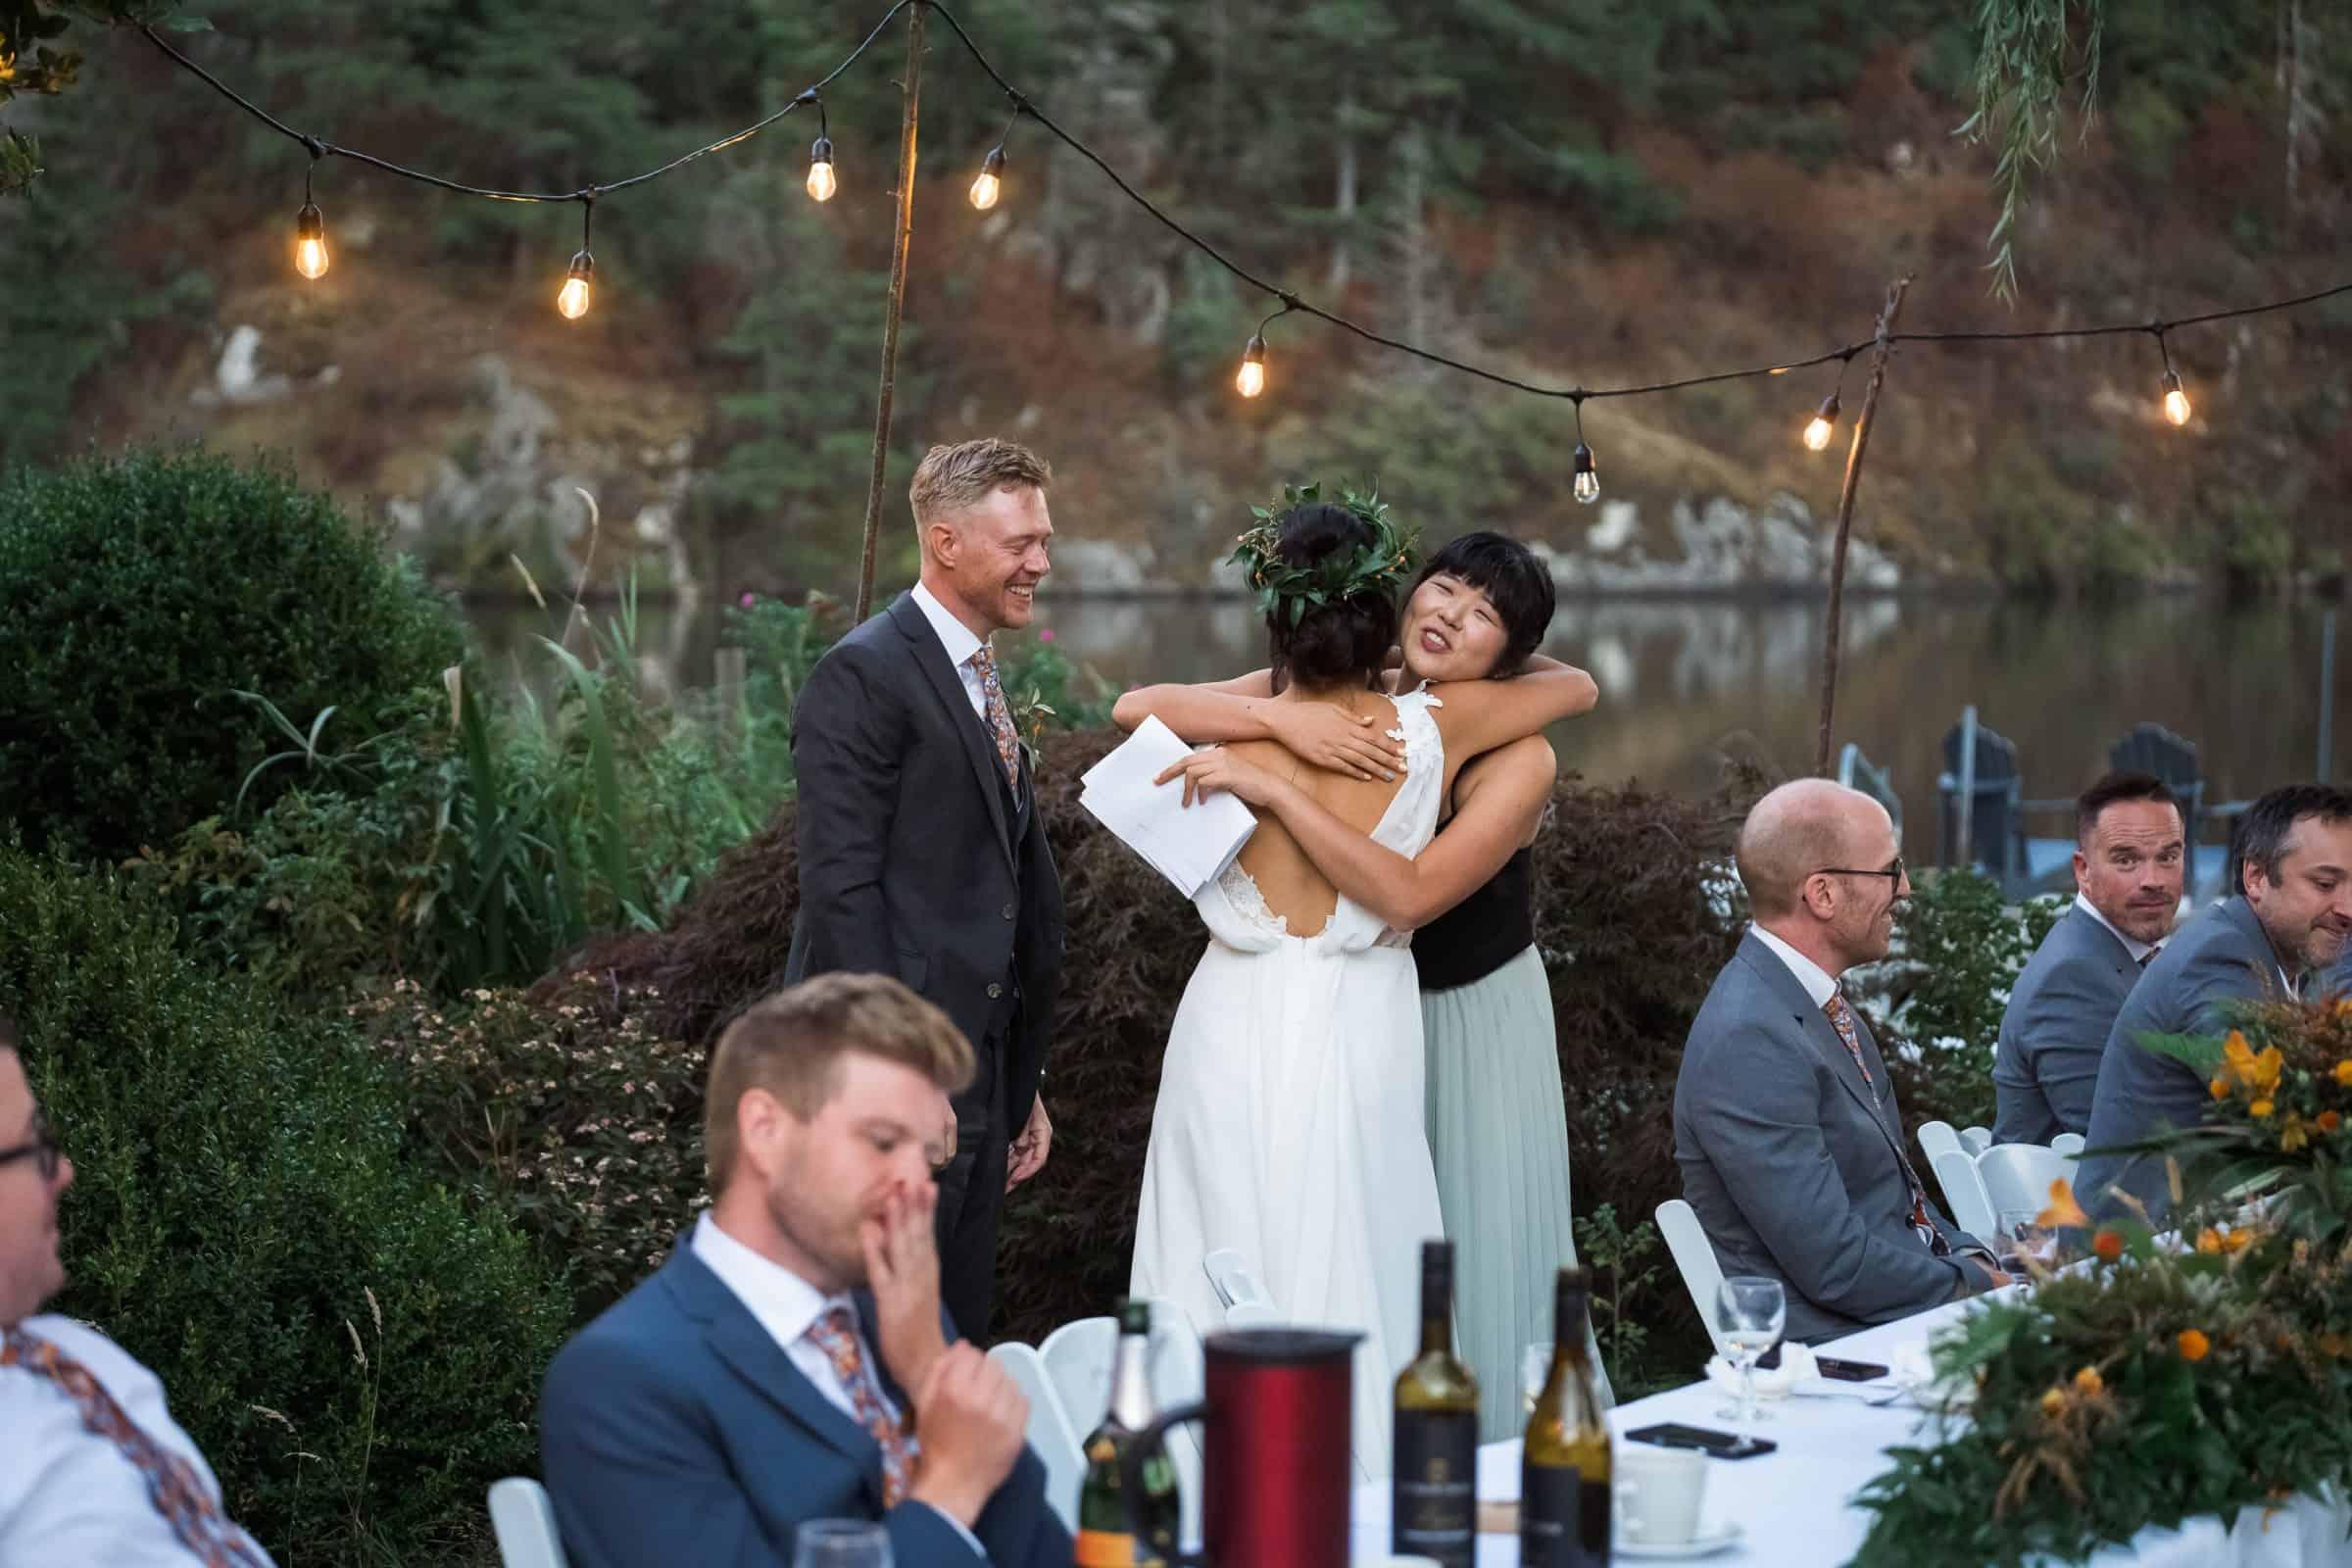 bride hugging maid of honour at head table at wedding